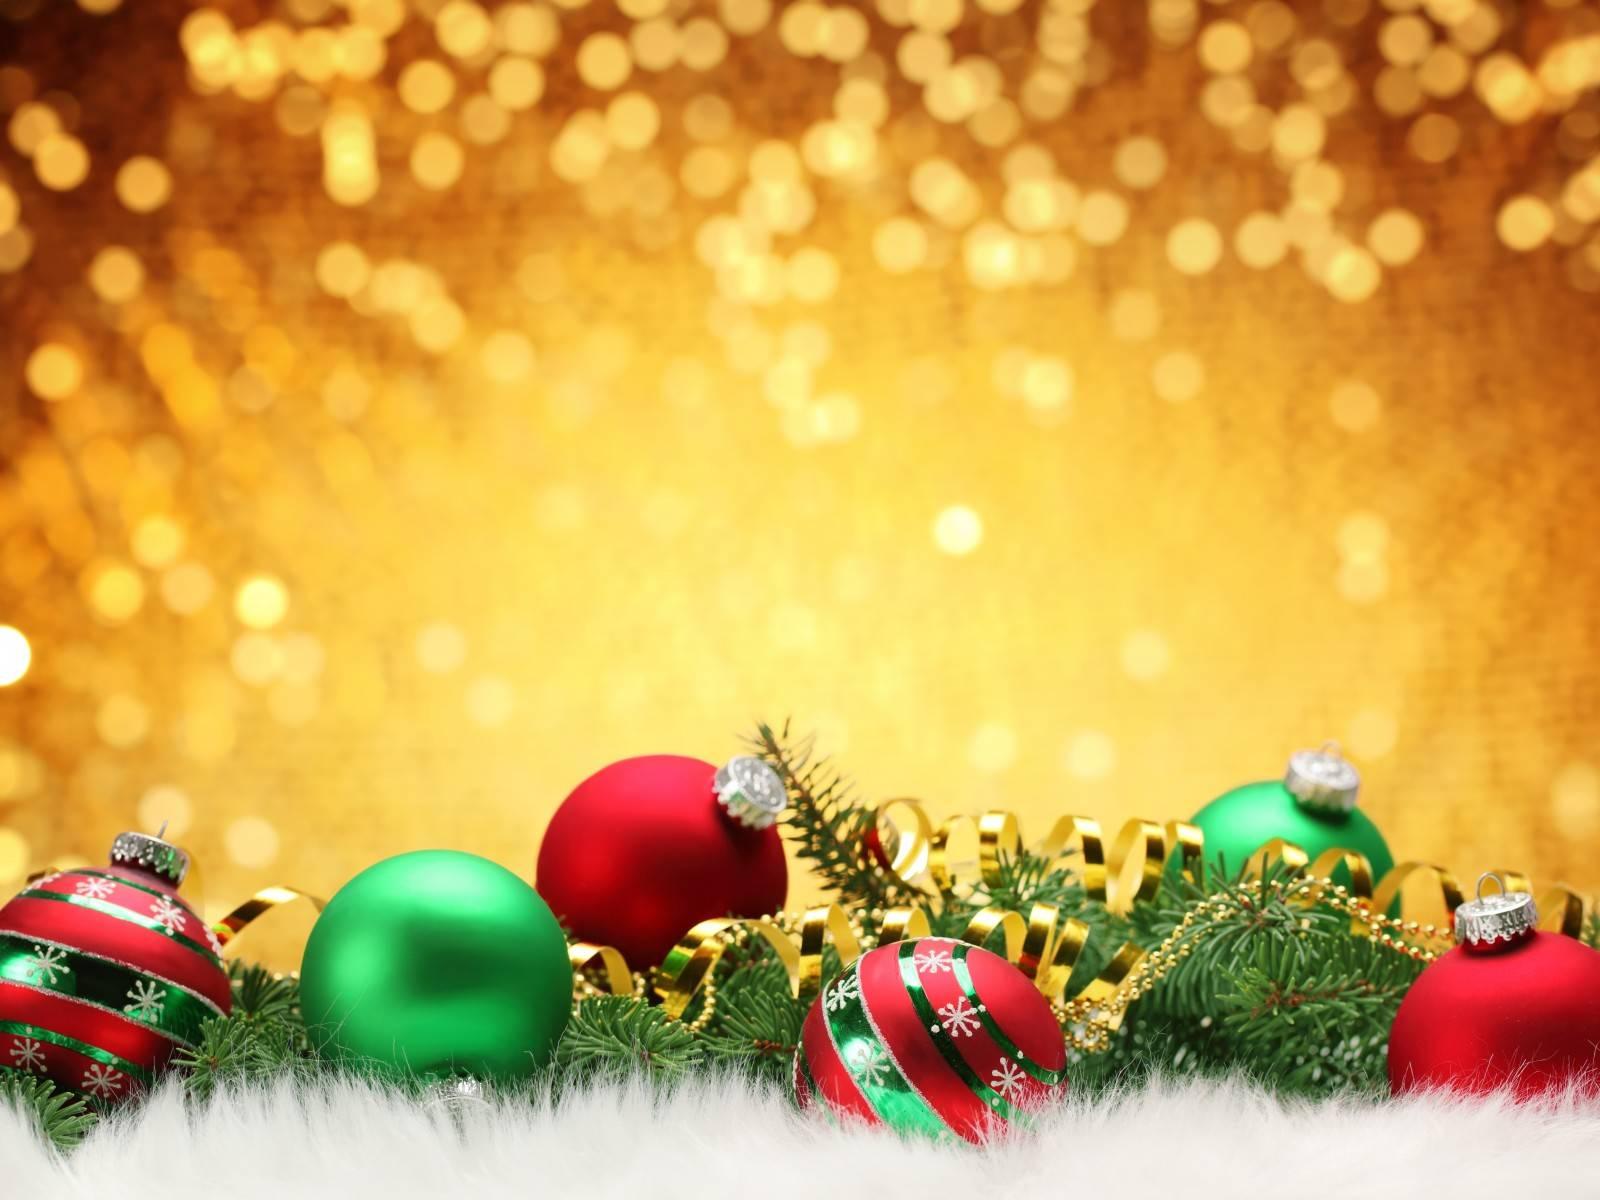 Christmas Background Wallpaper Sf Wallpaper